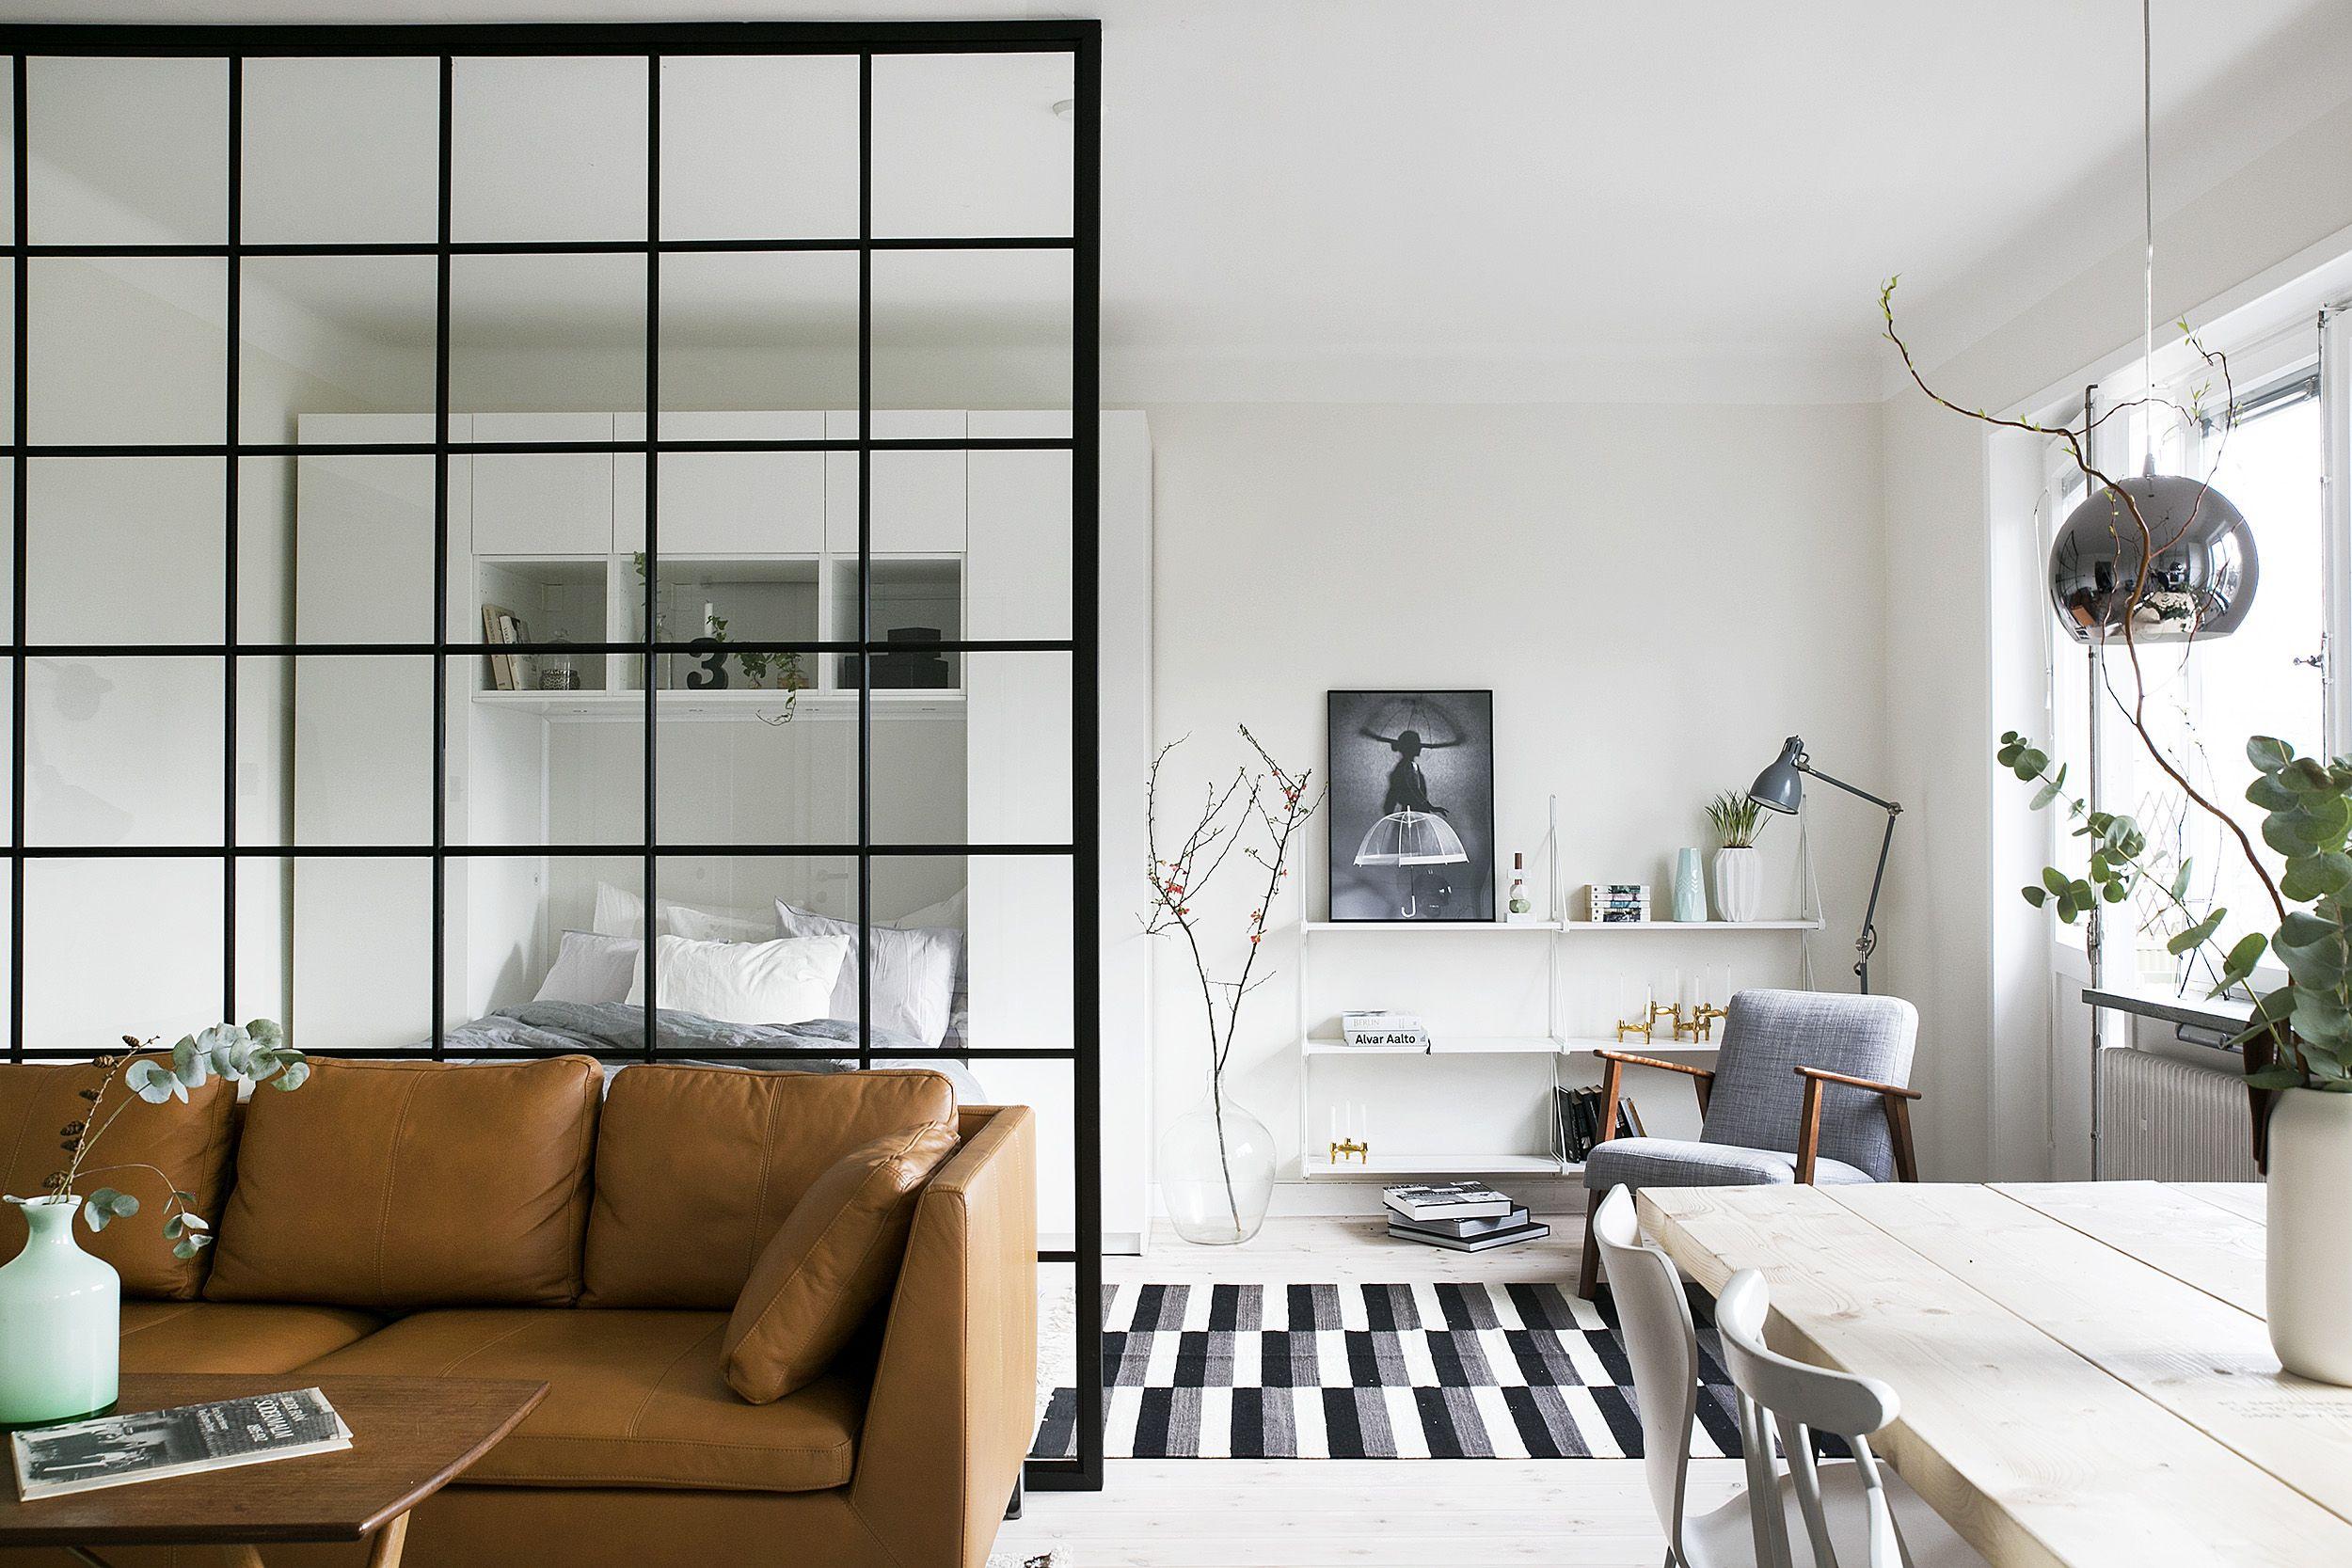 interior space design course